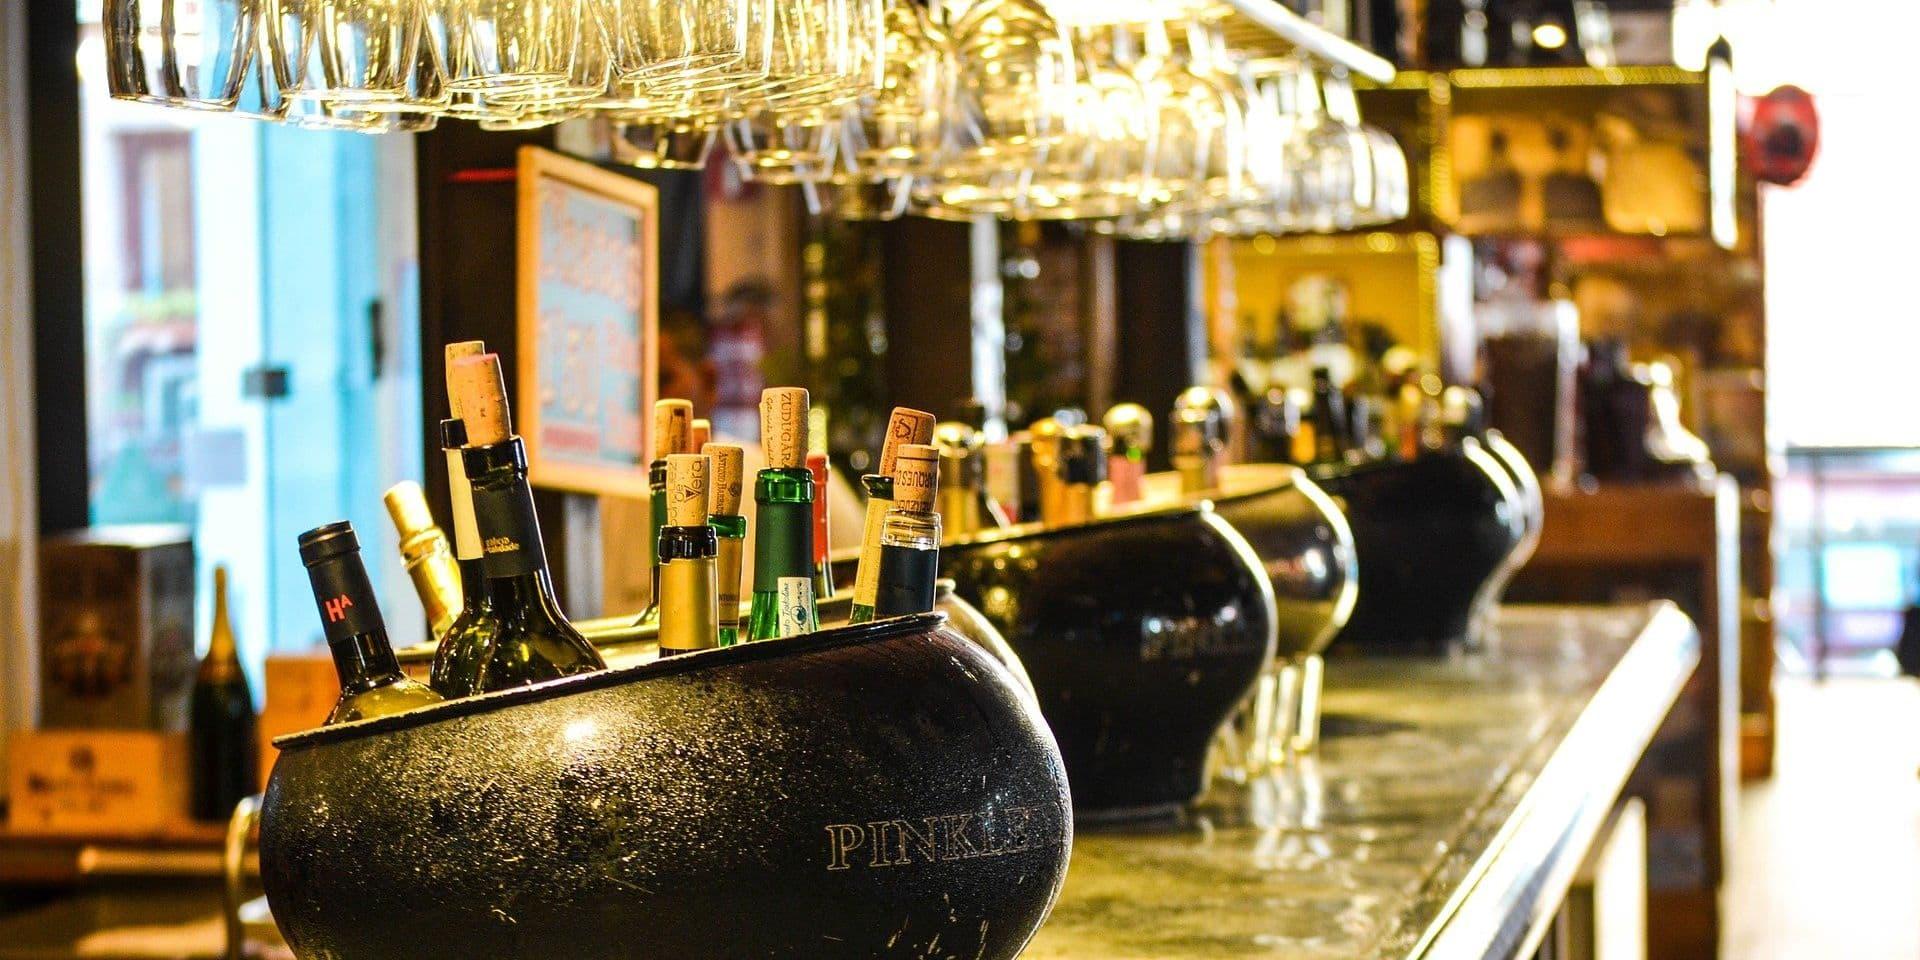 L'horeca peut vendre de l'alcool à emporter jusqu'à 20h00